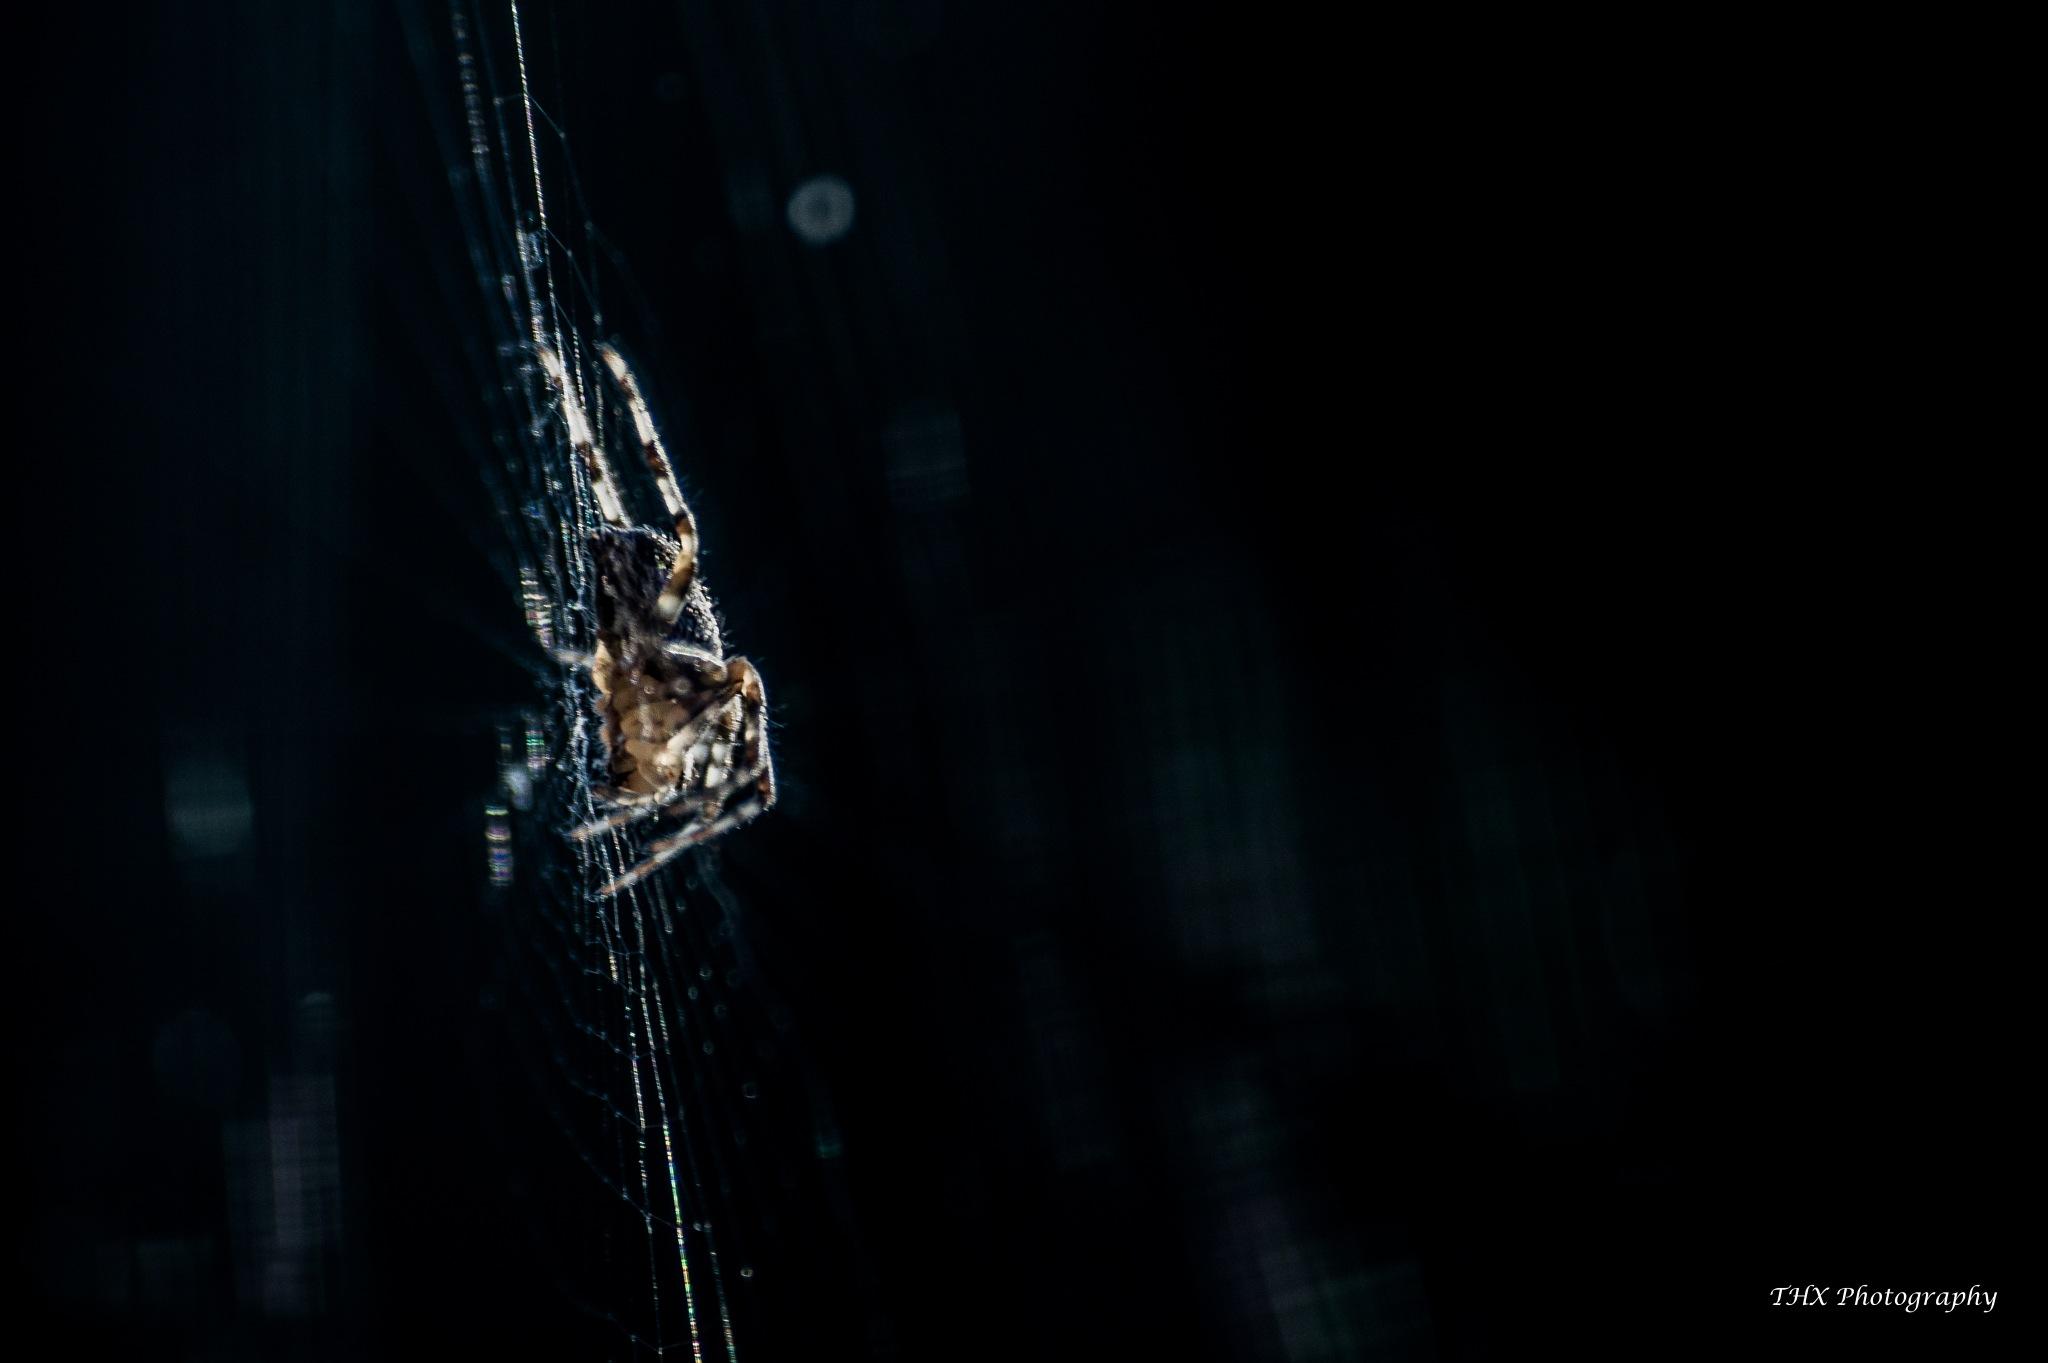 Morning spider by Yves Teyssier